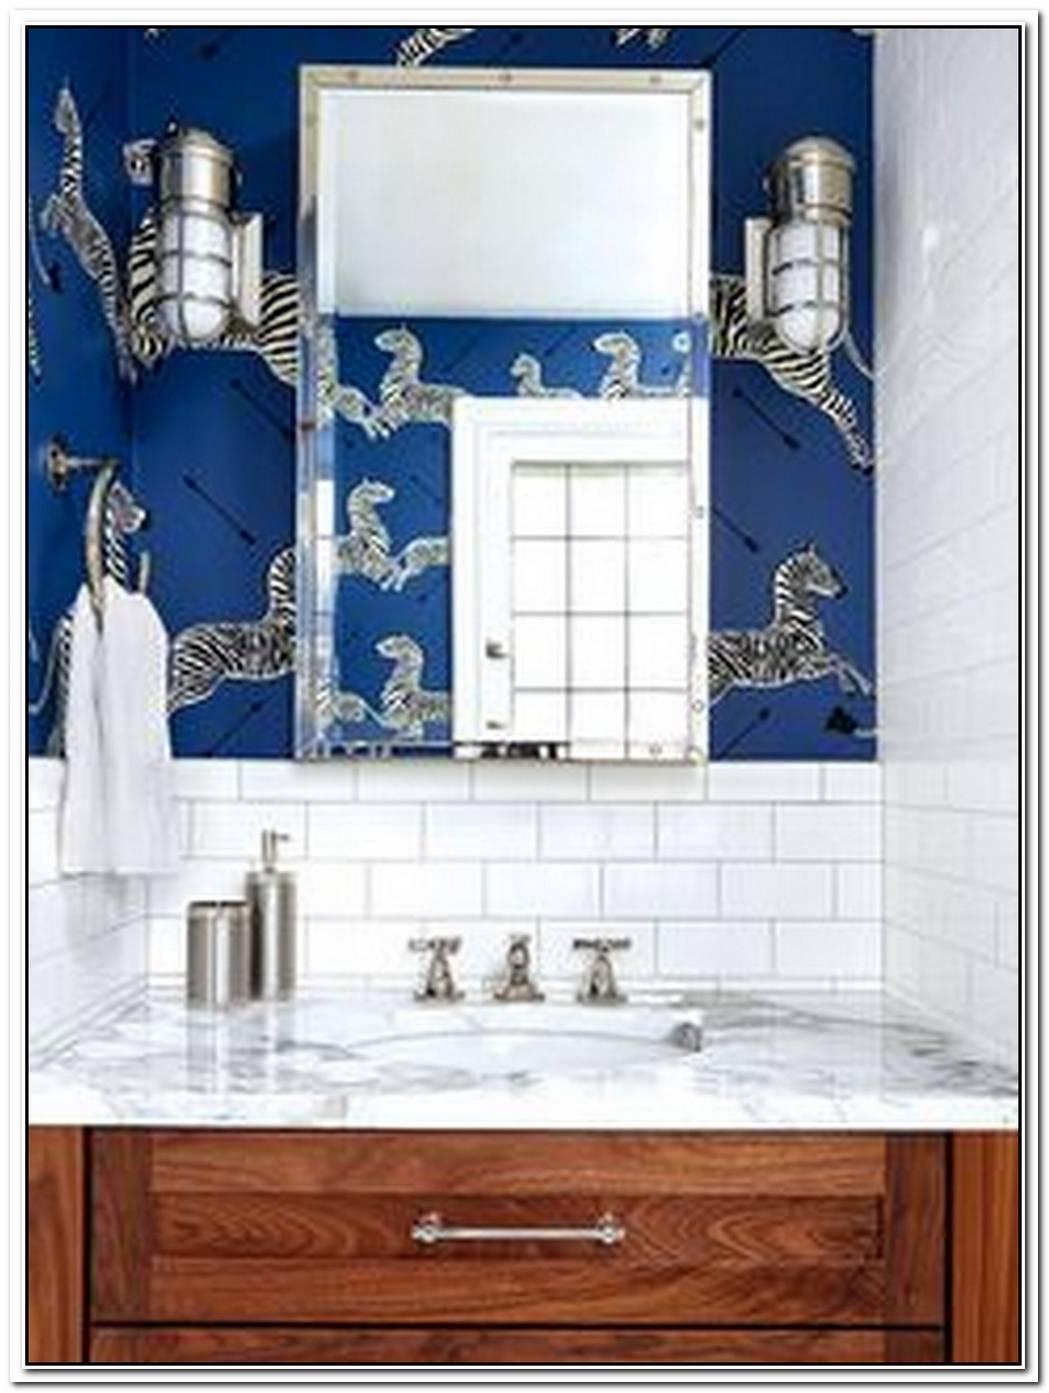 Mixed Metals And Cobalt Blue Create A Stunning Bathroom